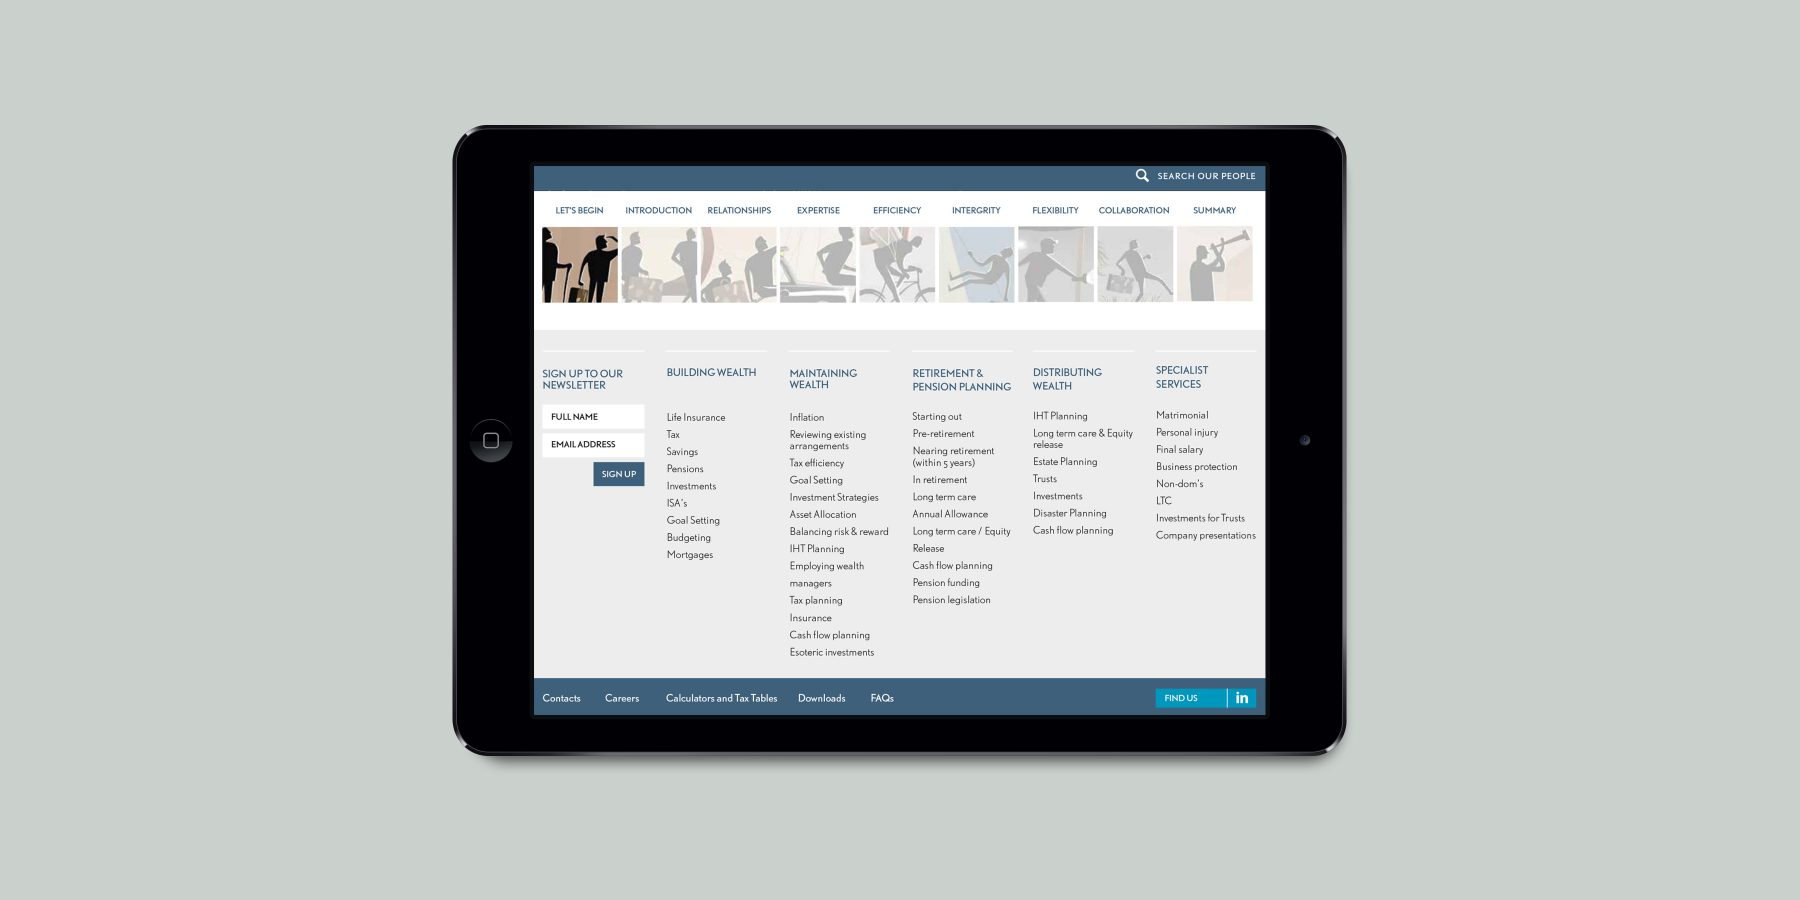 Punter Southall iPad